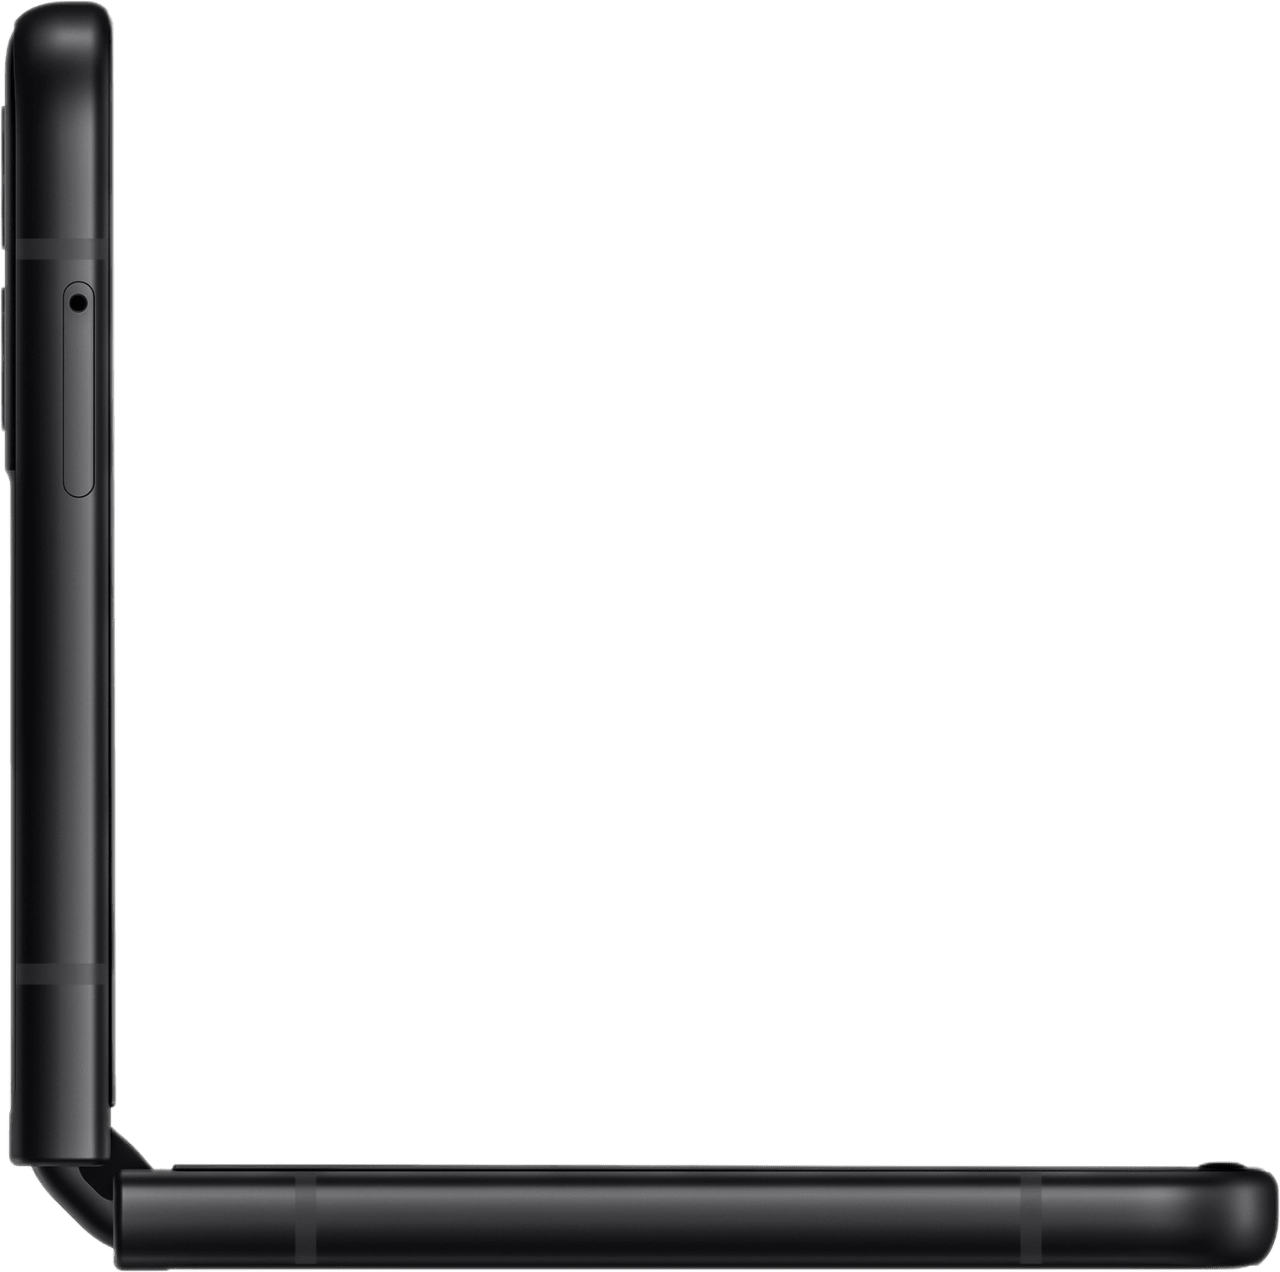 Negro Samsung Smartphone Galaxy Flip 3 - 128GB - Dual Sim.4